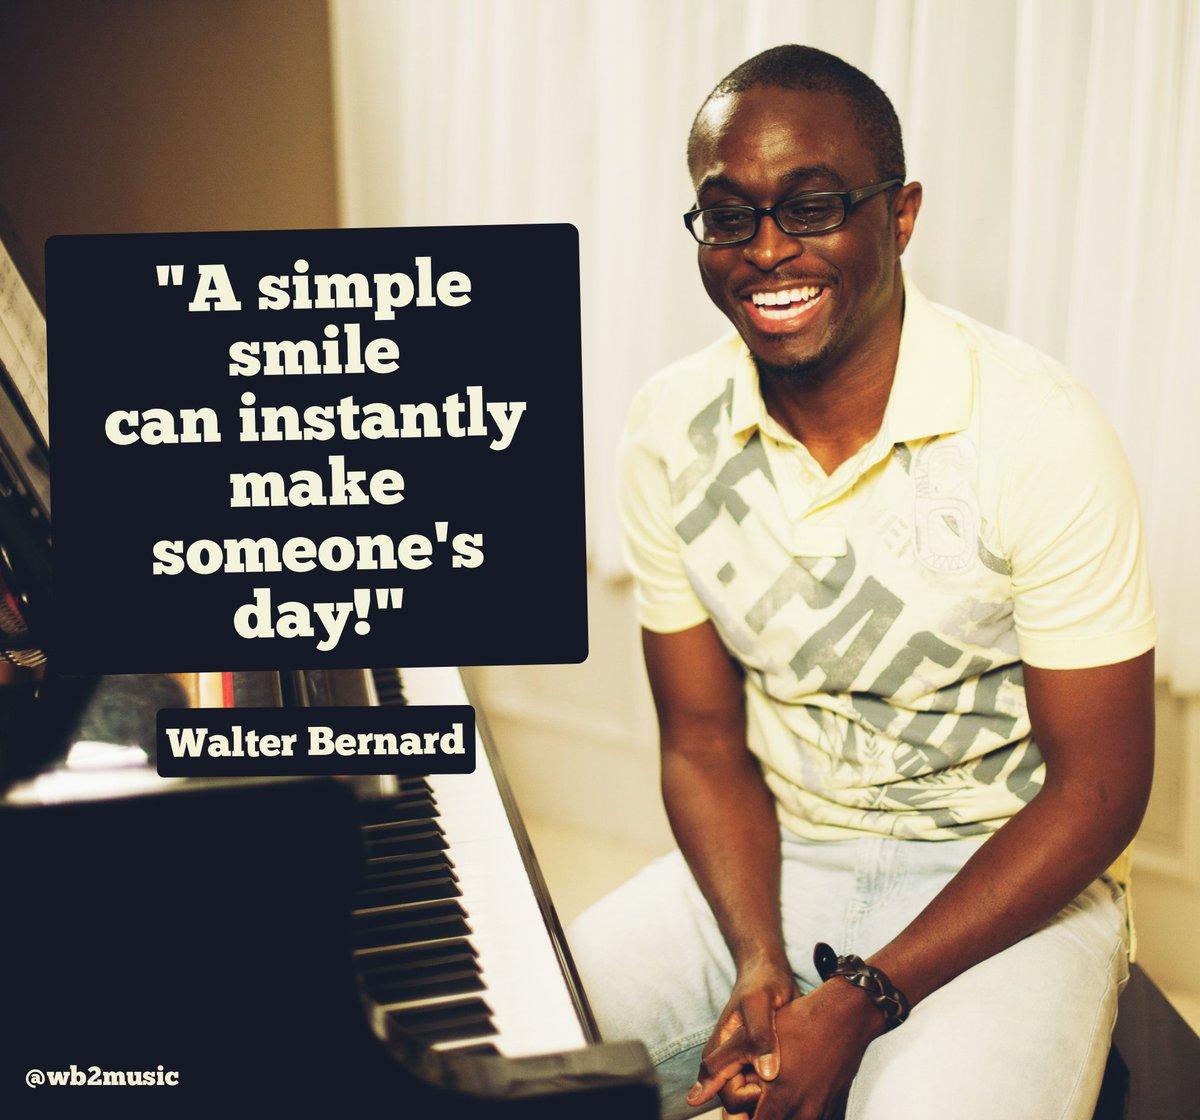 𝐢𝐒 𝐌 𝐈 𝐋 𝐄 . You should try it! #iSmile #Smile #SmileMore #WalterBernard  Monica Johnsonpic.twitter.com/rqg5a94HUu